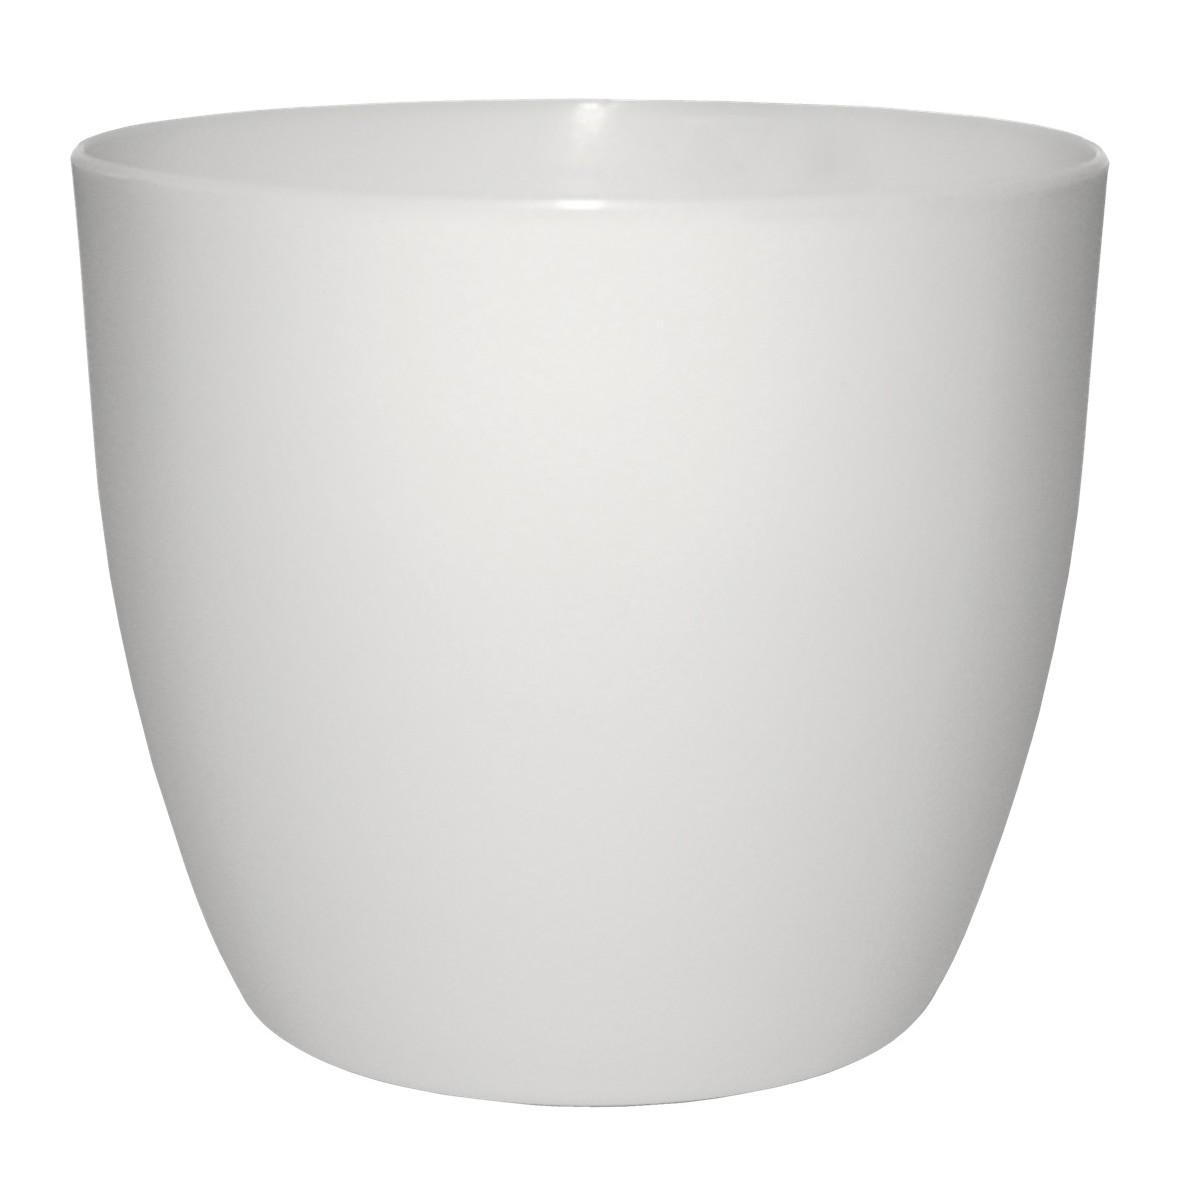 Vaso para Plantas Plastico 15cm Musique Branco VPMRR15 - Japi